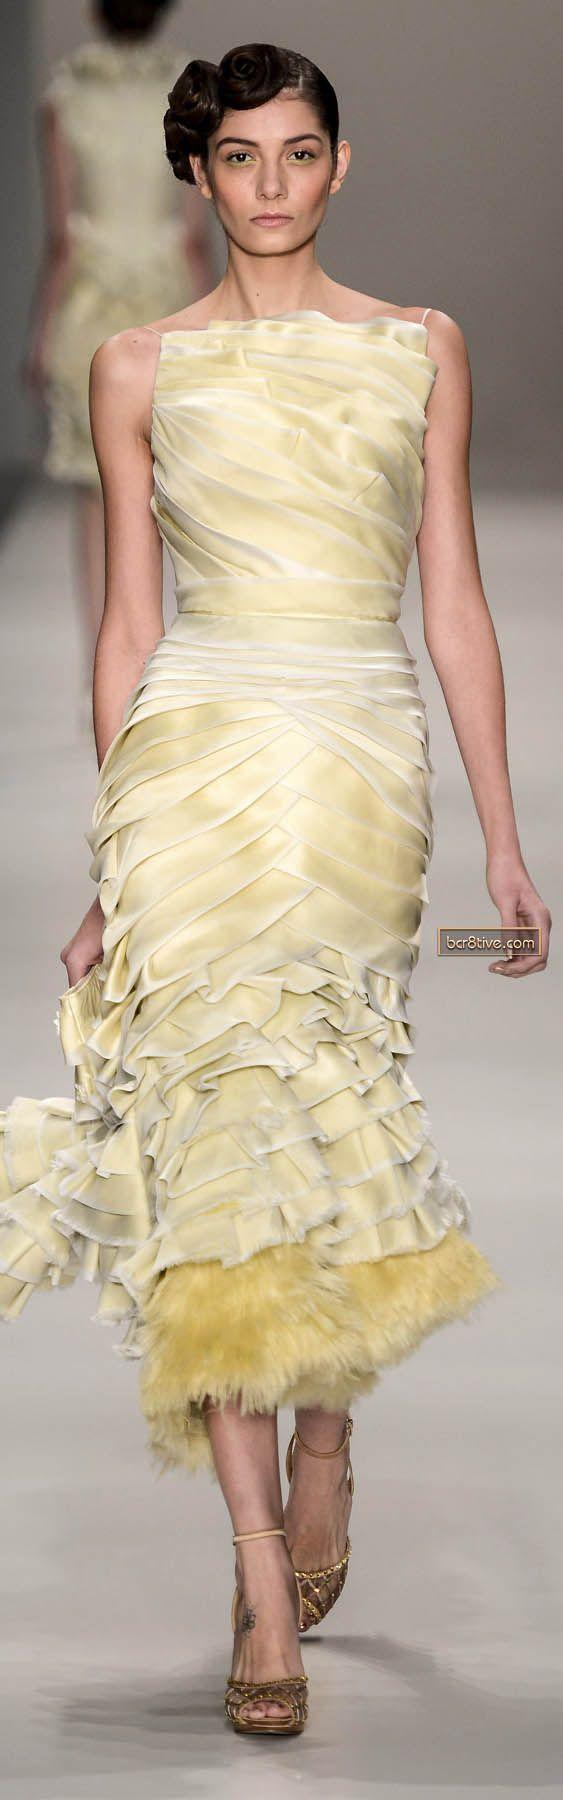 Pale Yellow Cocktail Dress – fashion dresses